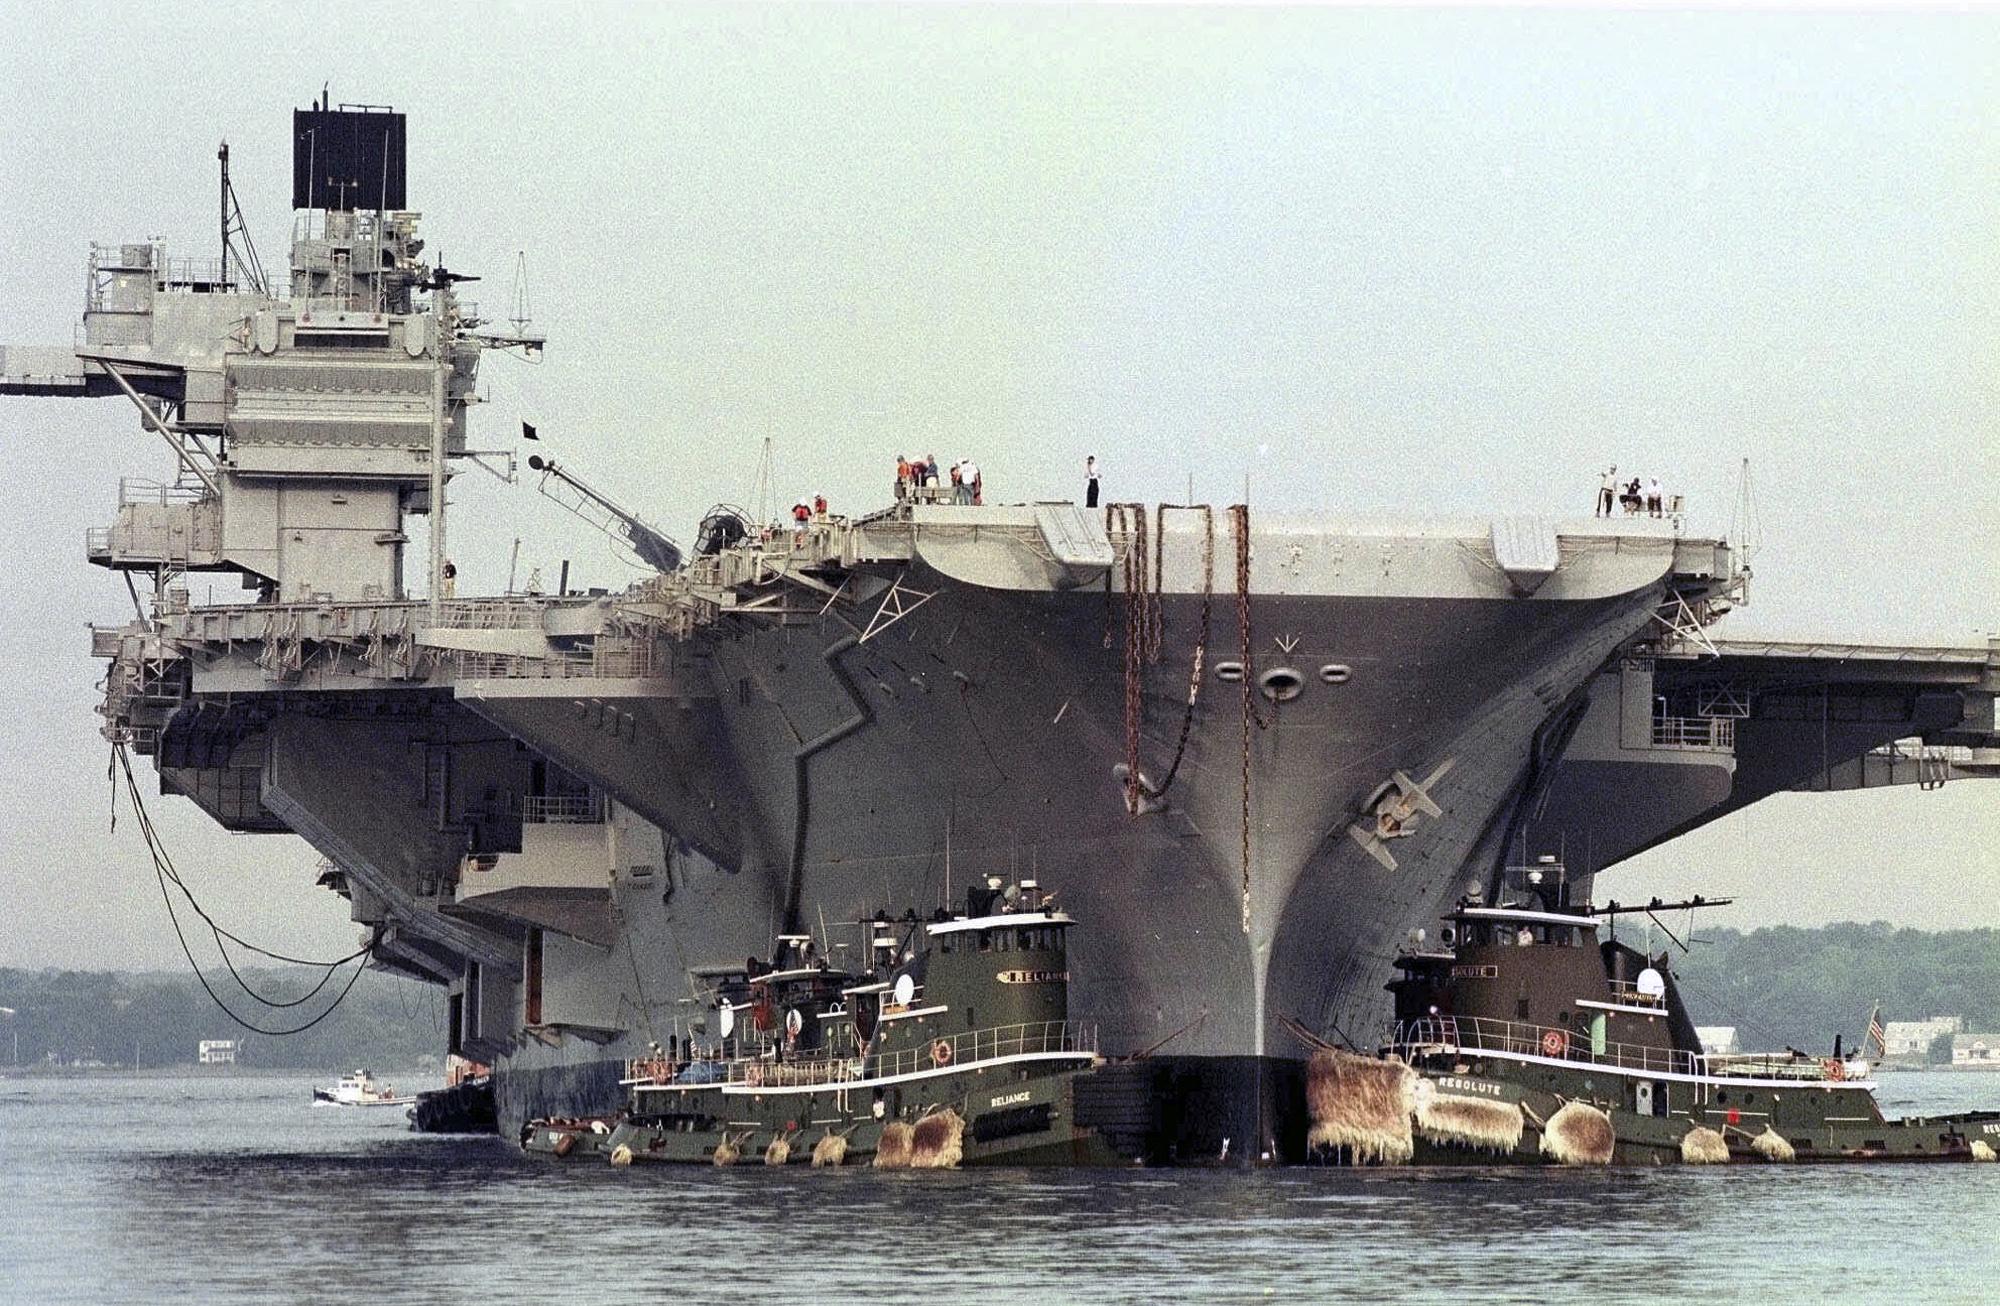 ex-USS SARATOGA CV-60 am 21.08.2014 in Newport, RI Bild: AP